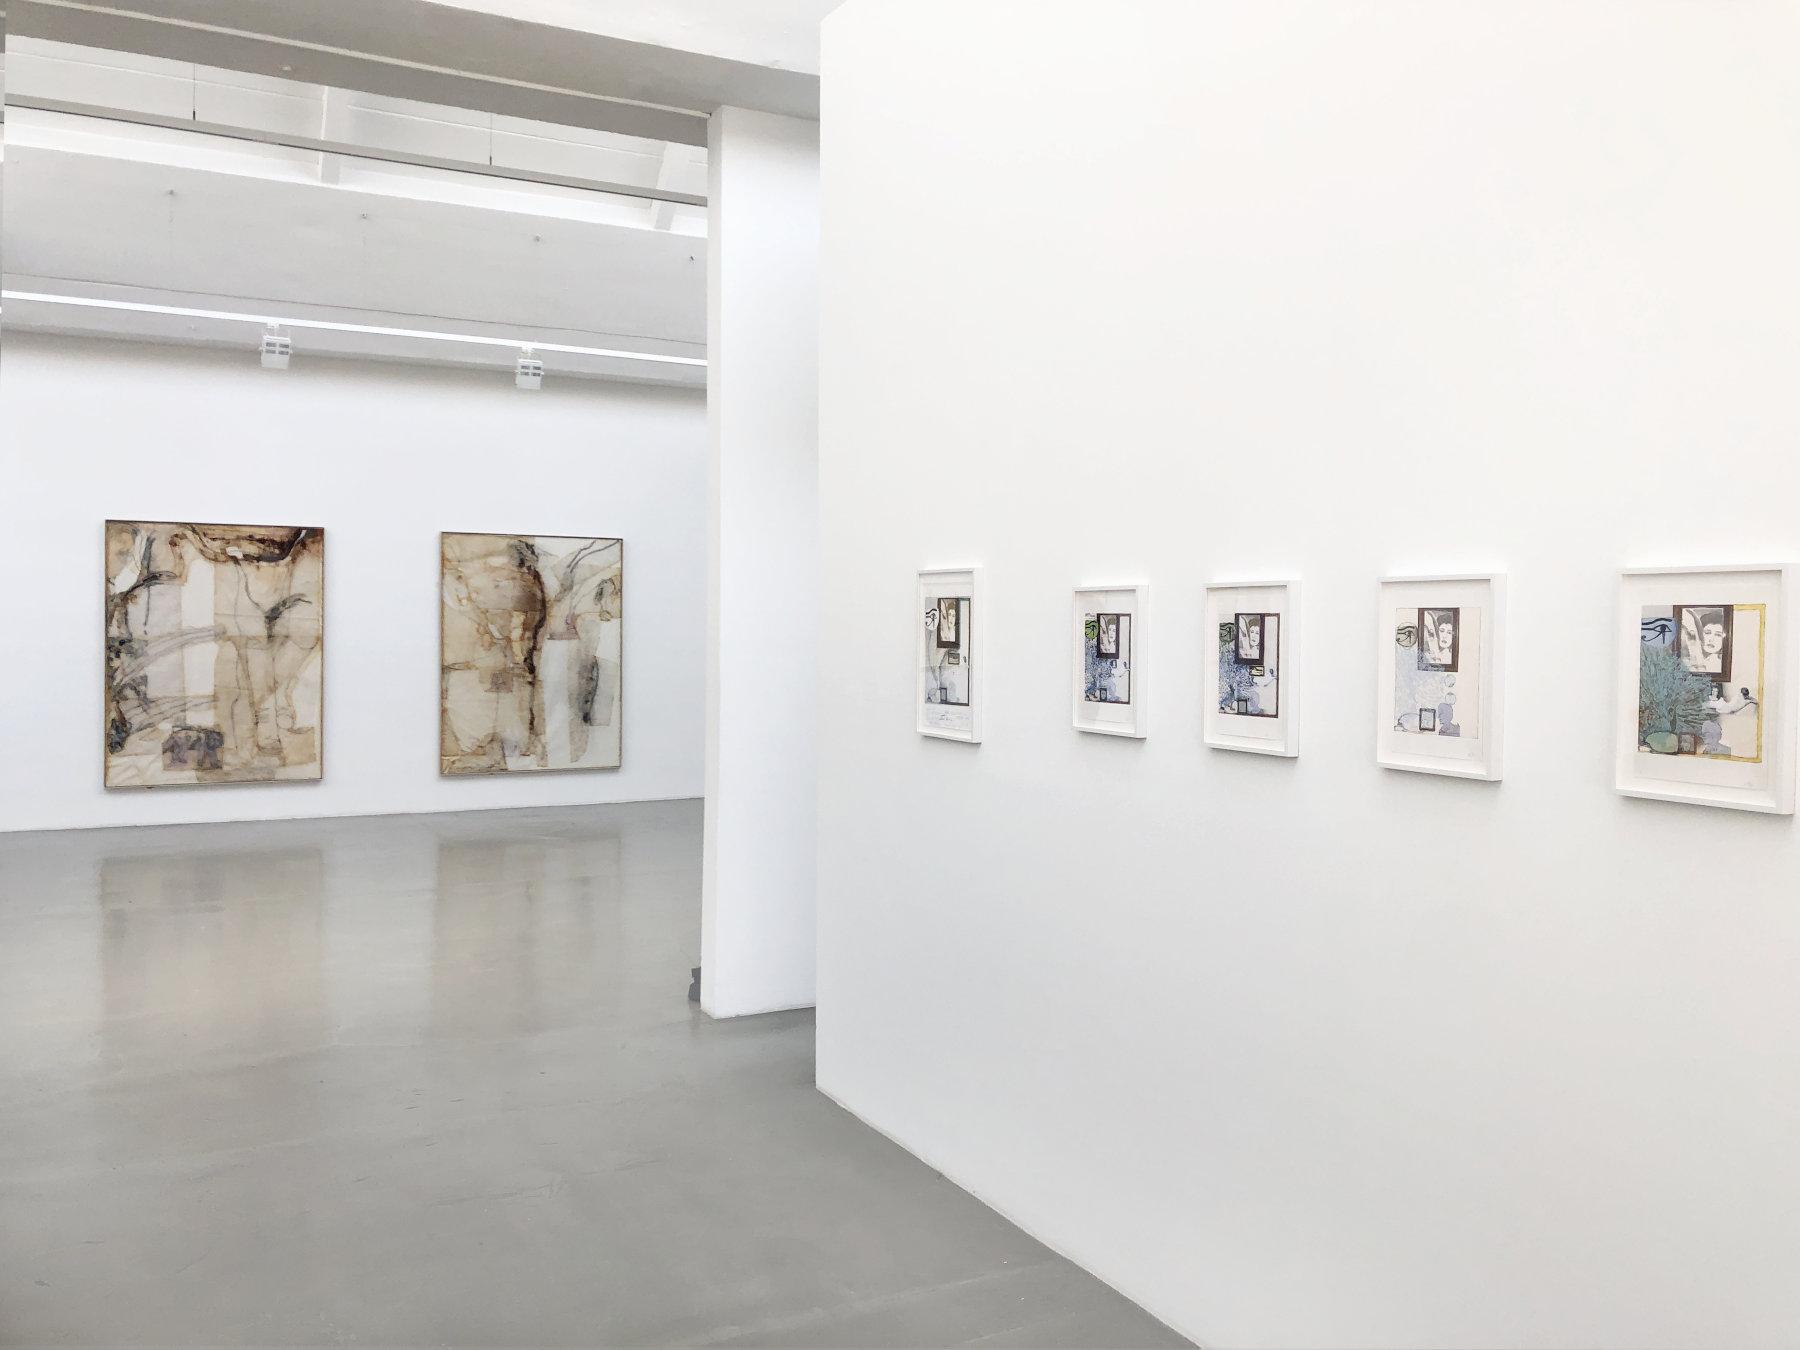 Galerie Barbara Thumm Jo Baer 1